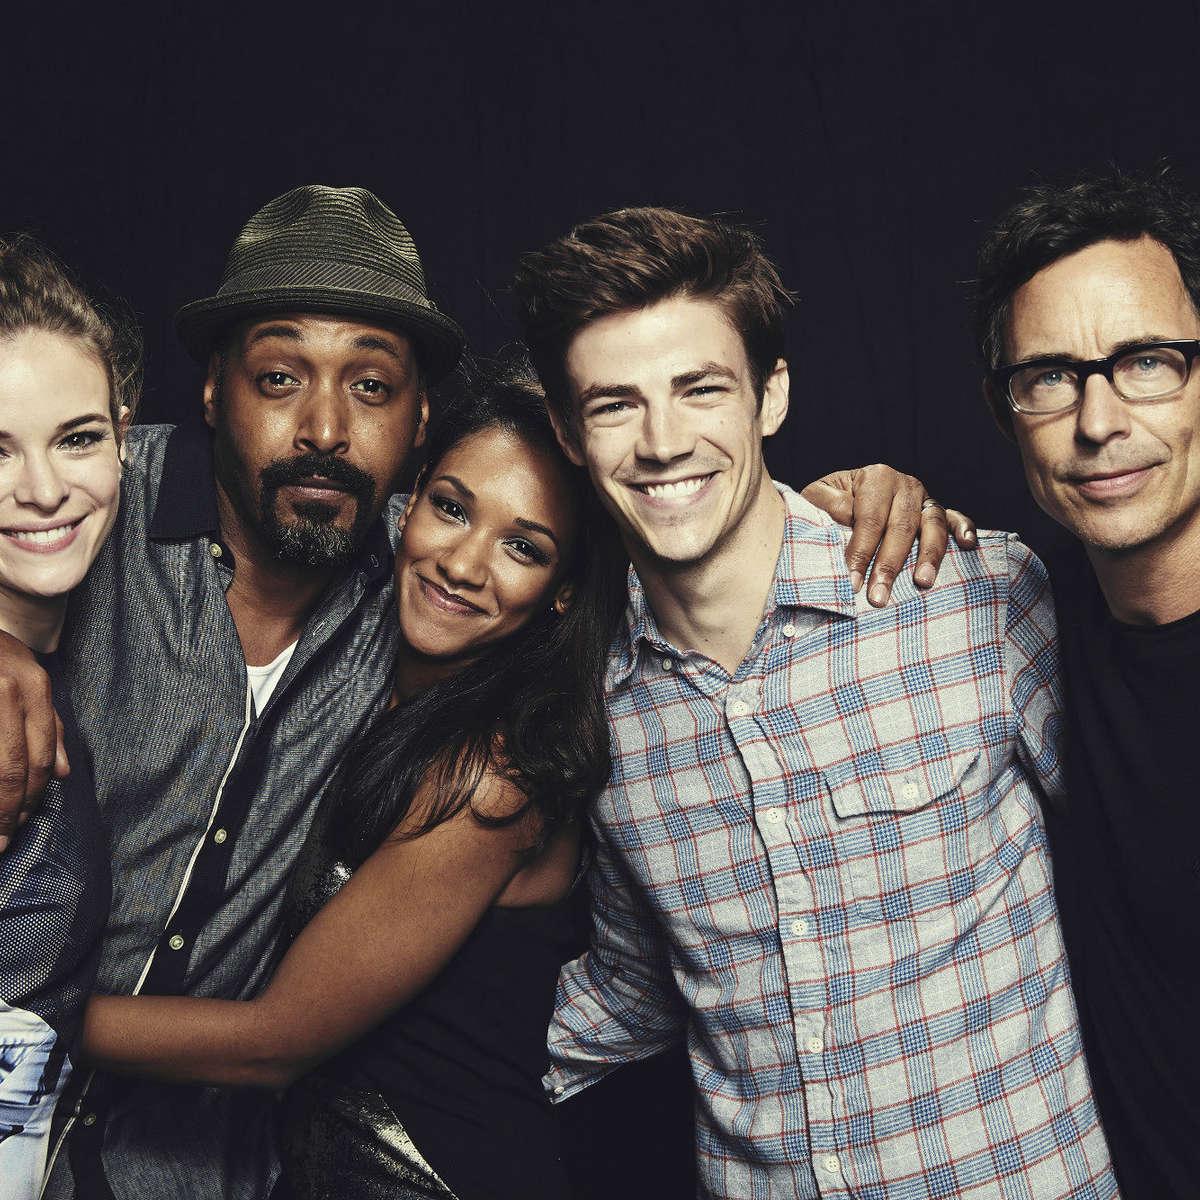 the-flash-cast-just-went-full-joss-whedon-326693.jpg